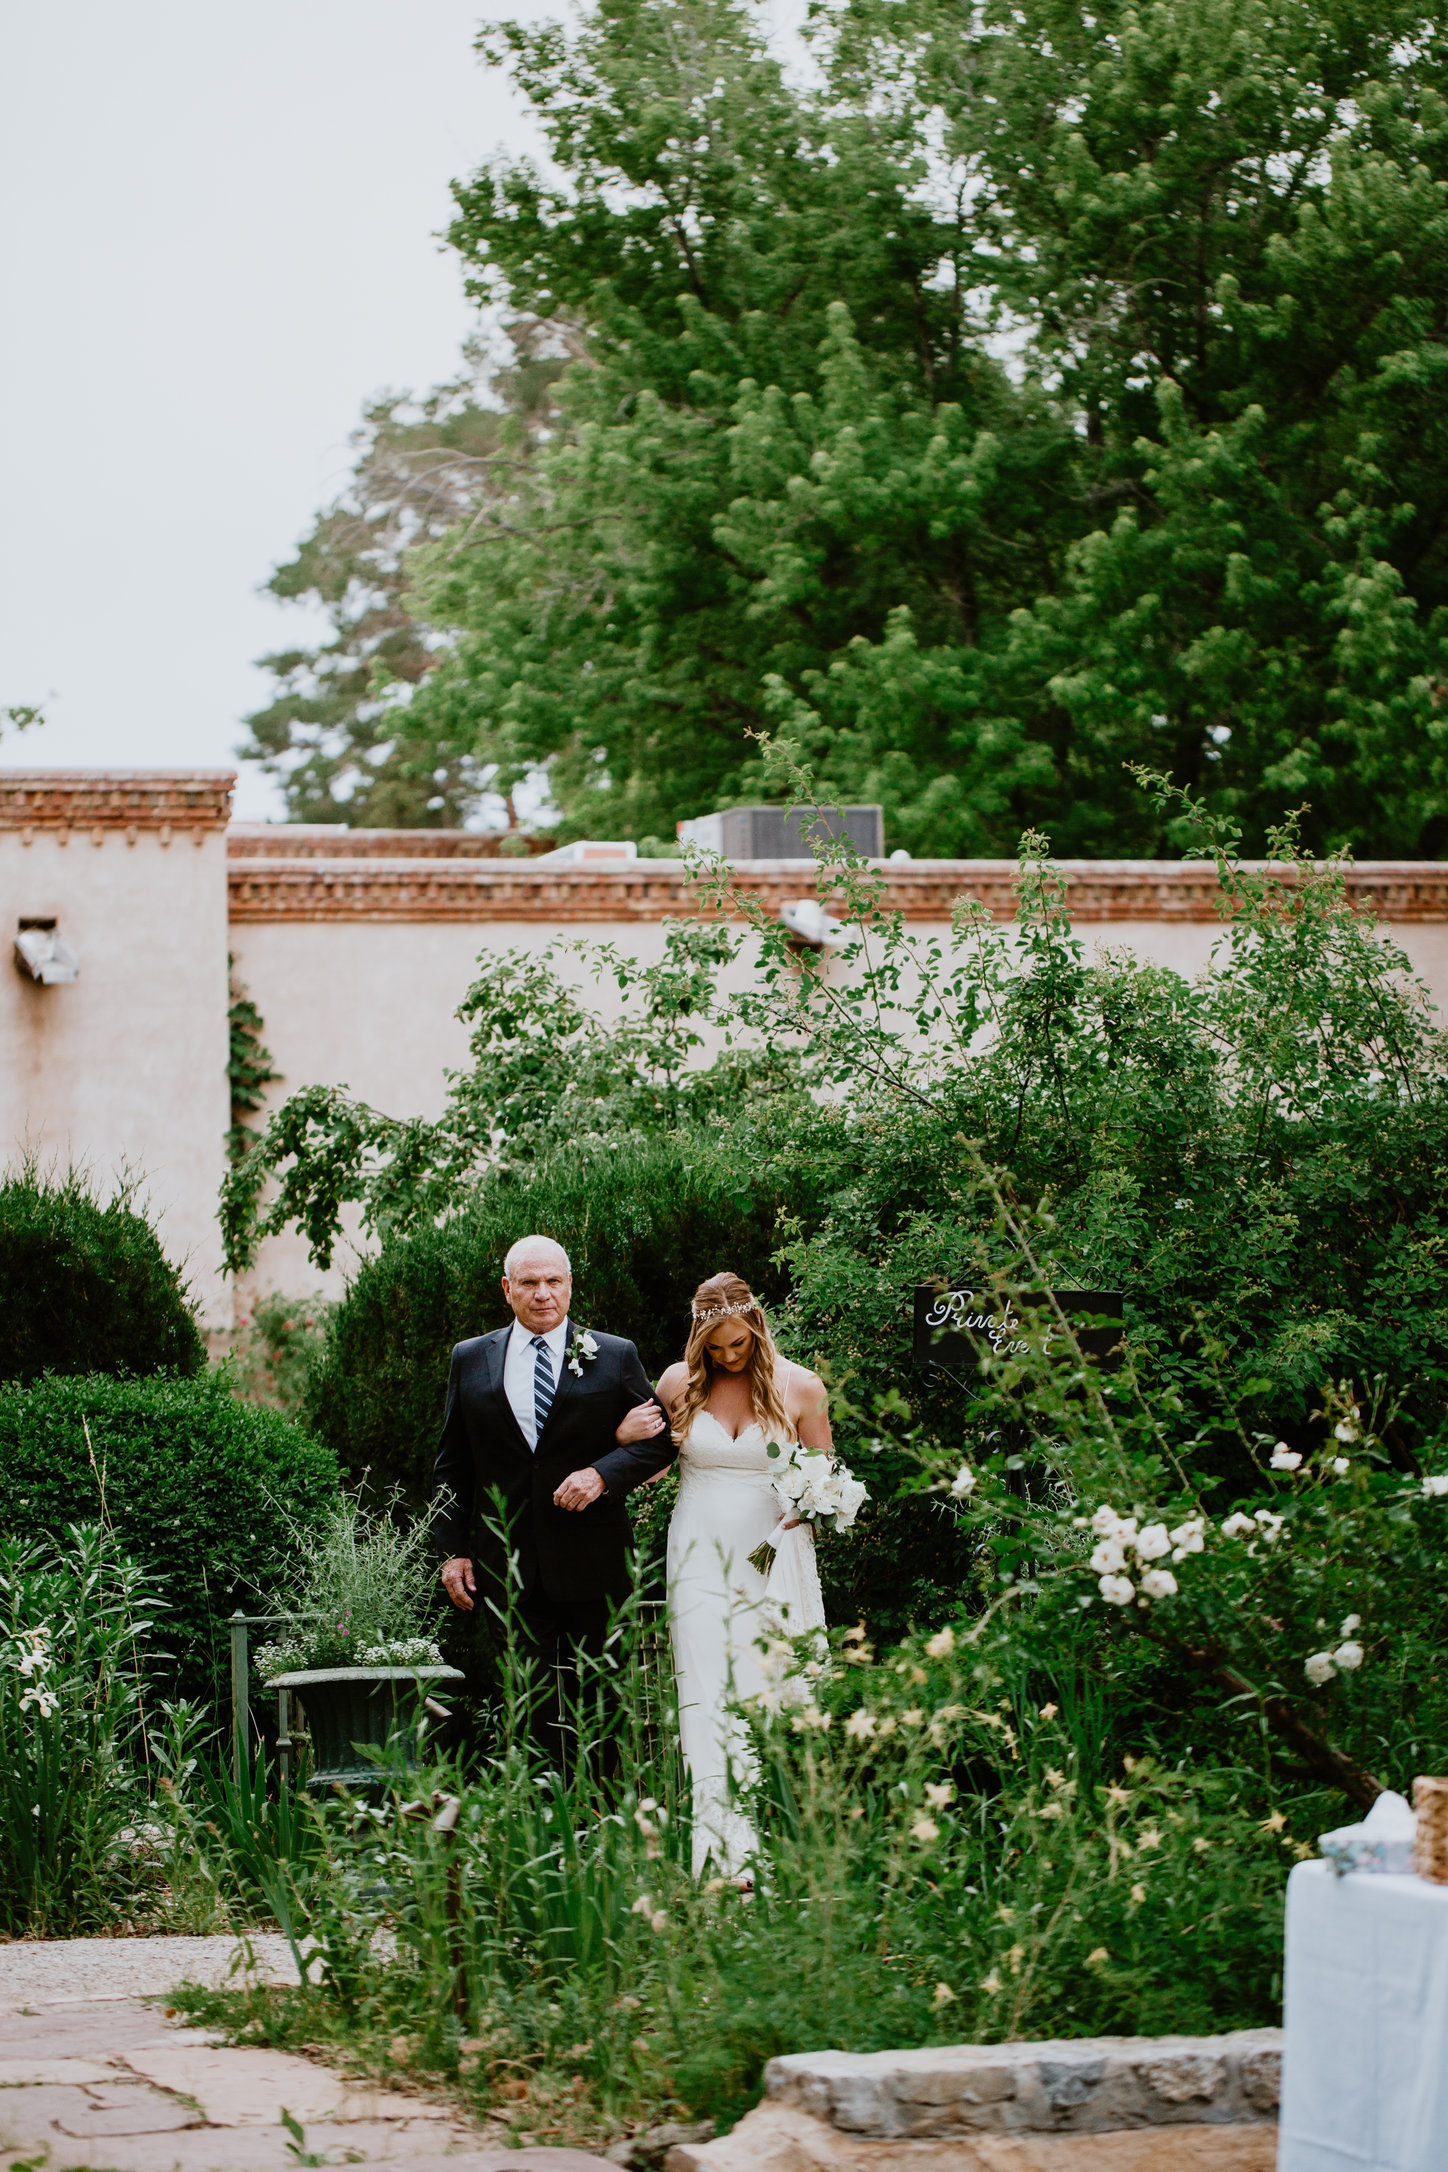 DandA-wedding-222.jpg